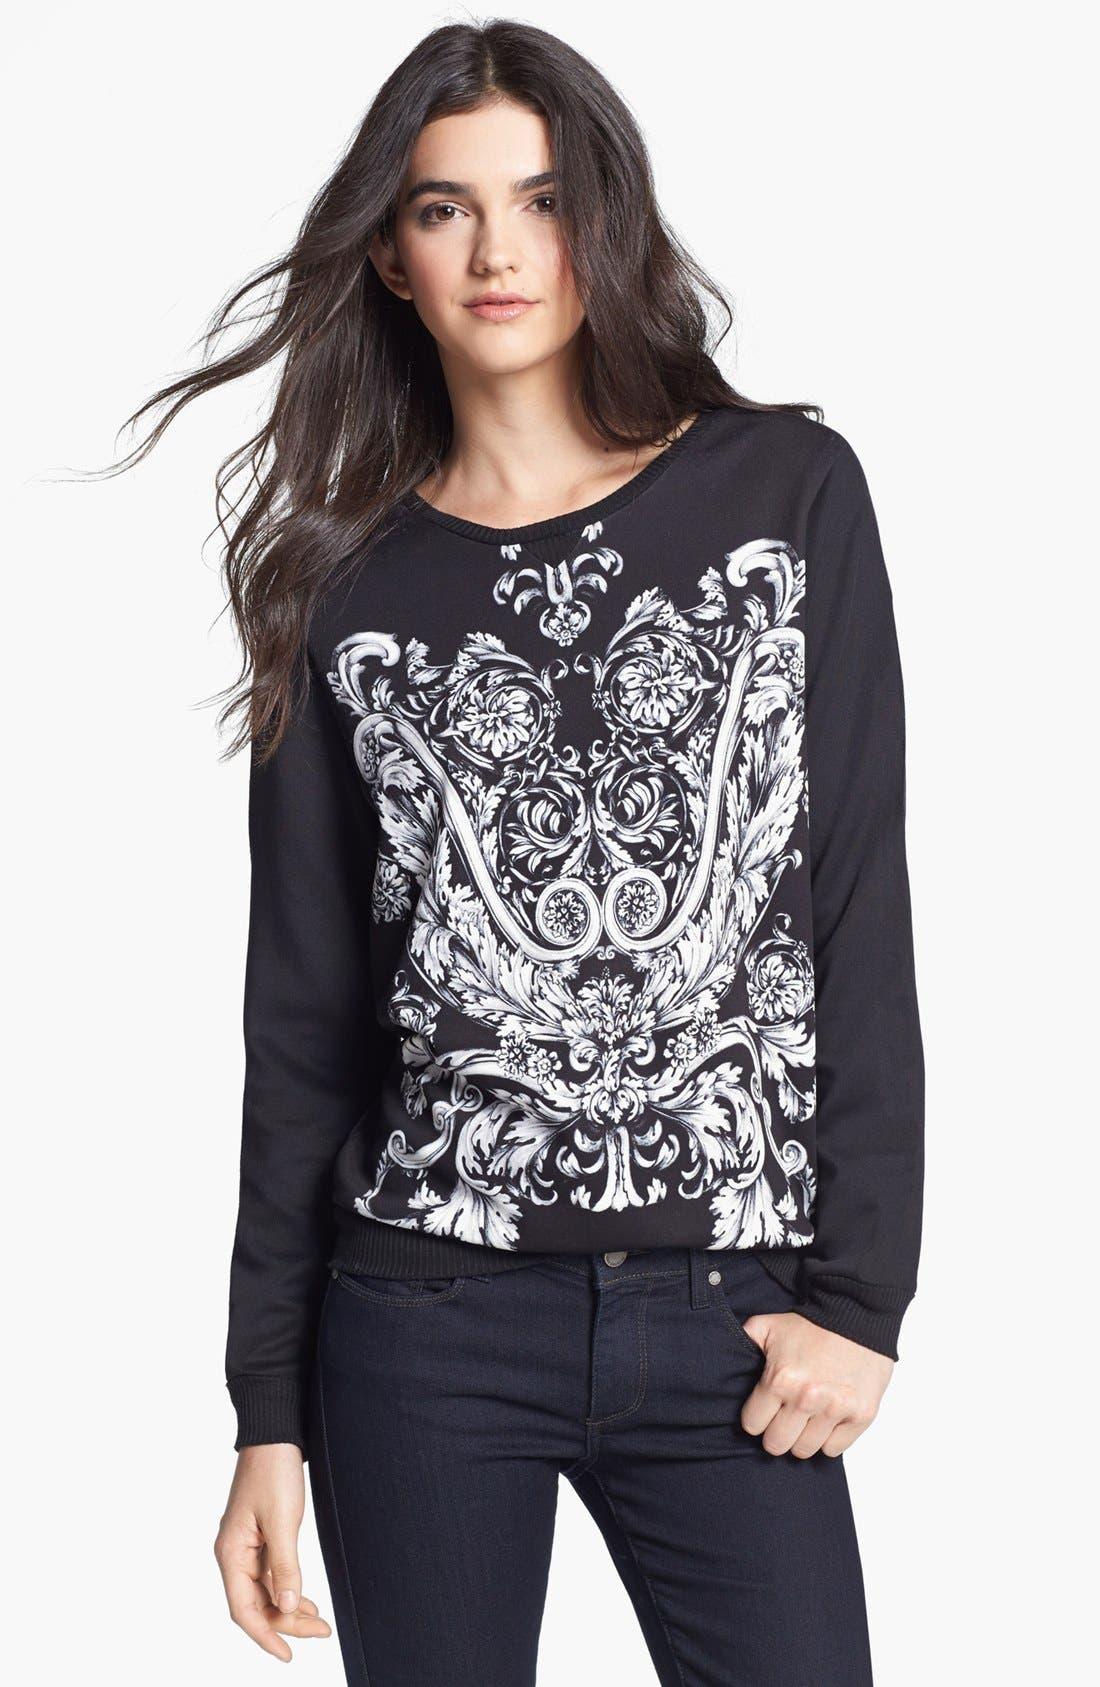 Alternate Image 1 Selected - WAYF 'Baroque' Sweatshirt